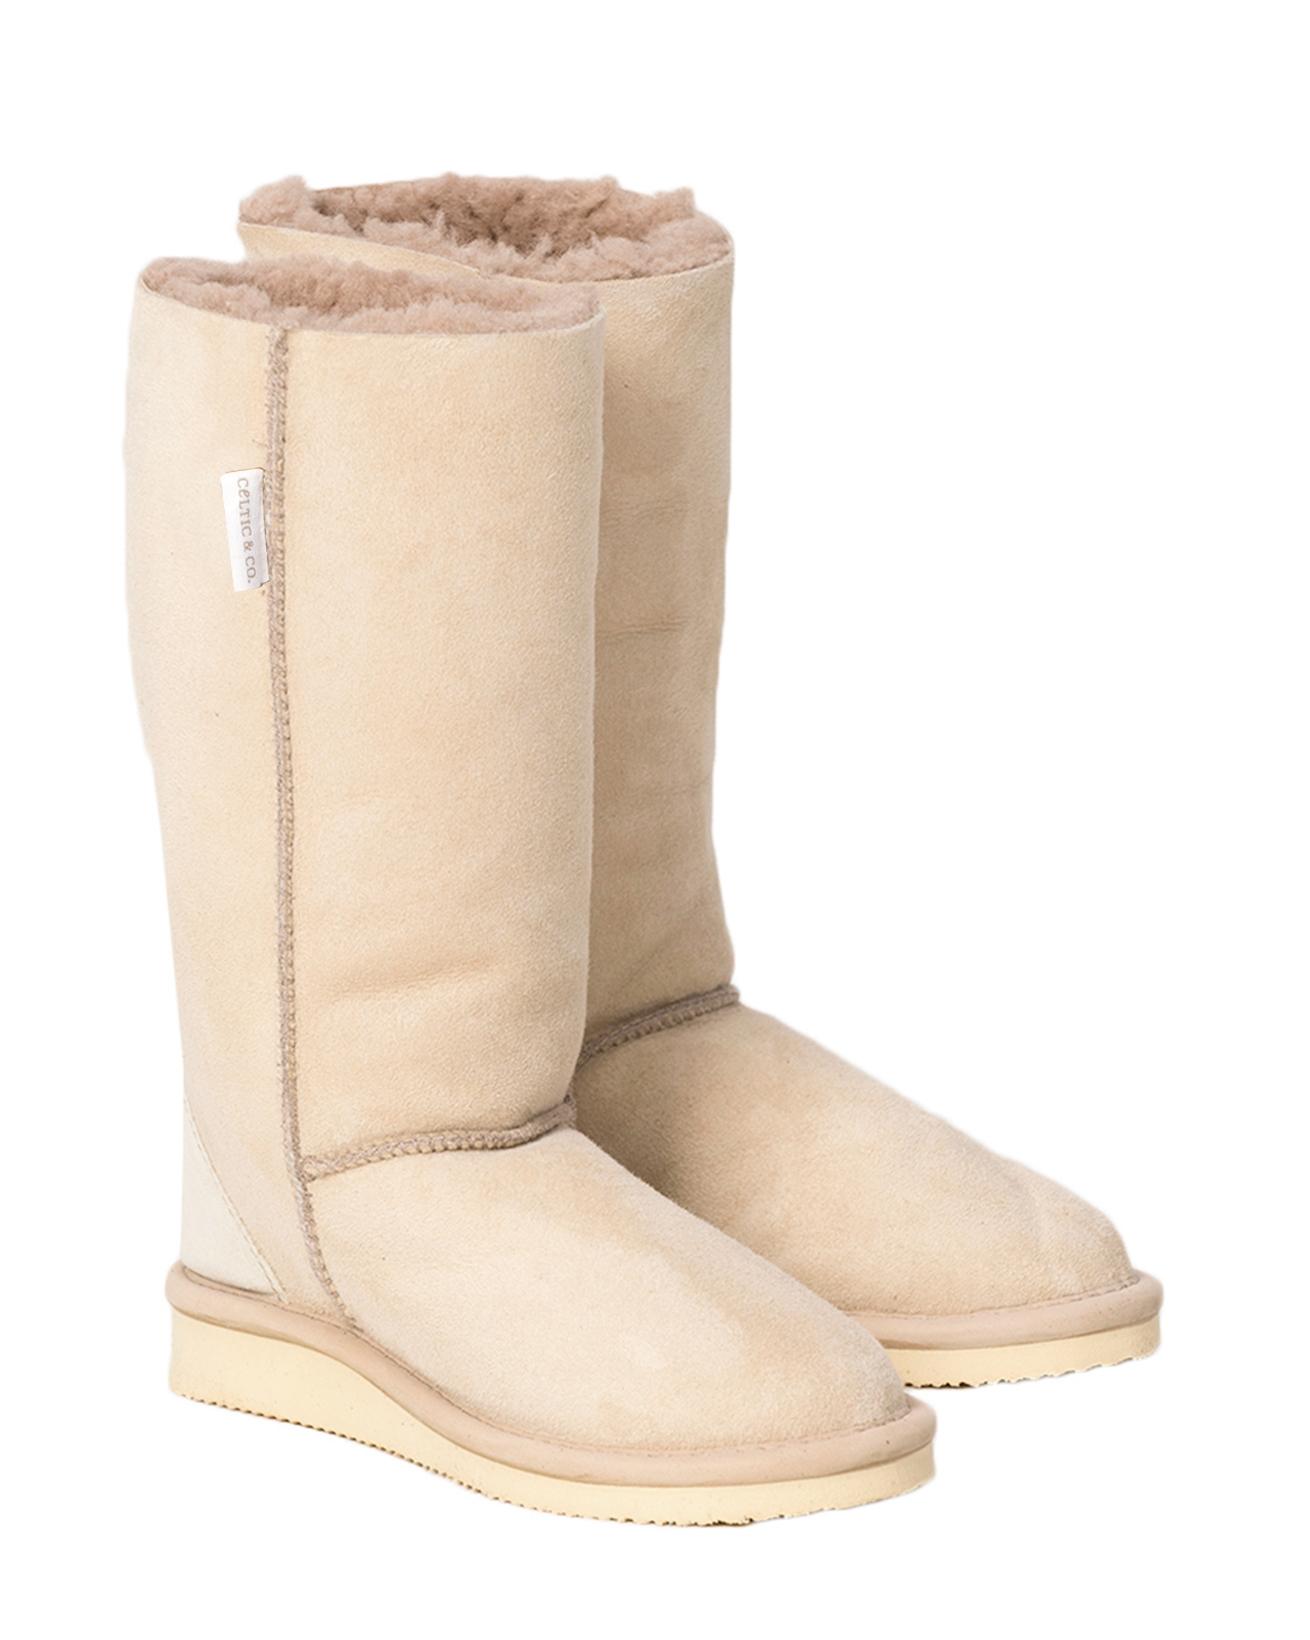 House Boots Calf - Size 3 - Oatmeal - 1995